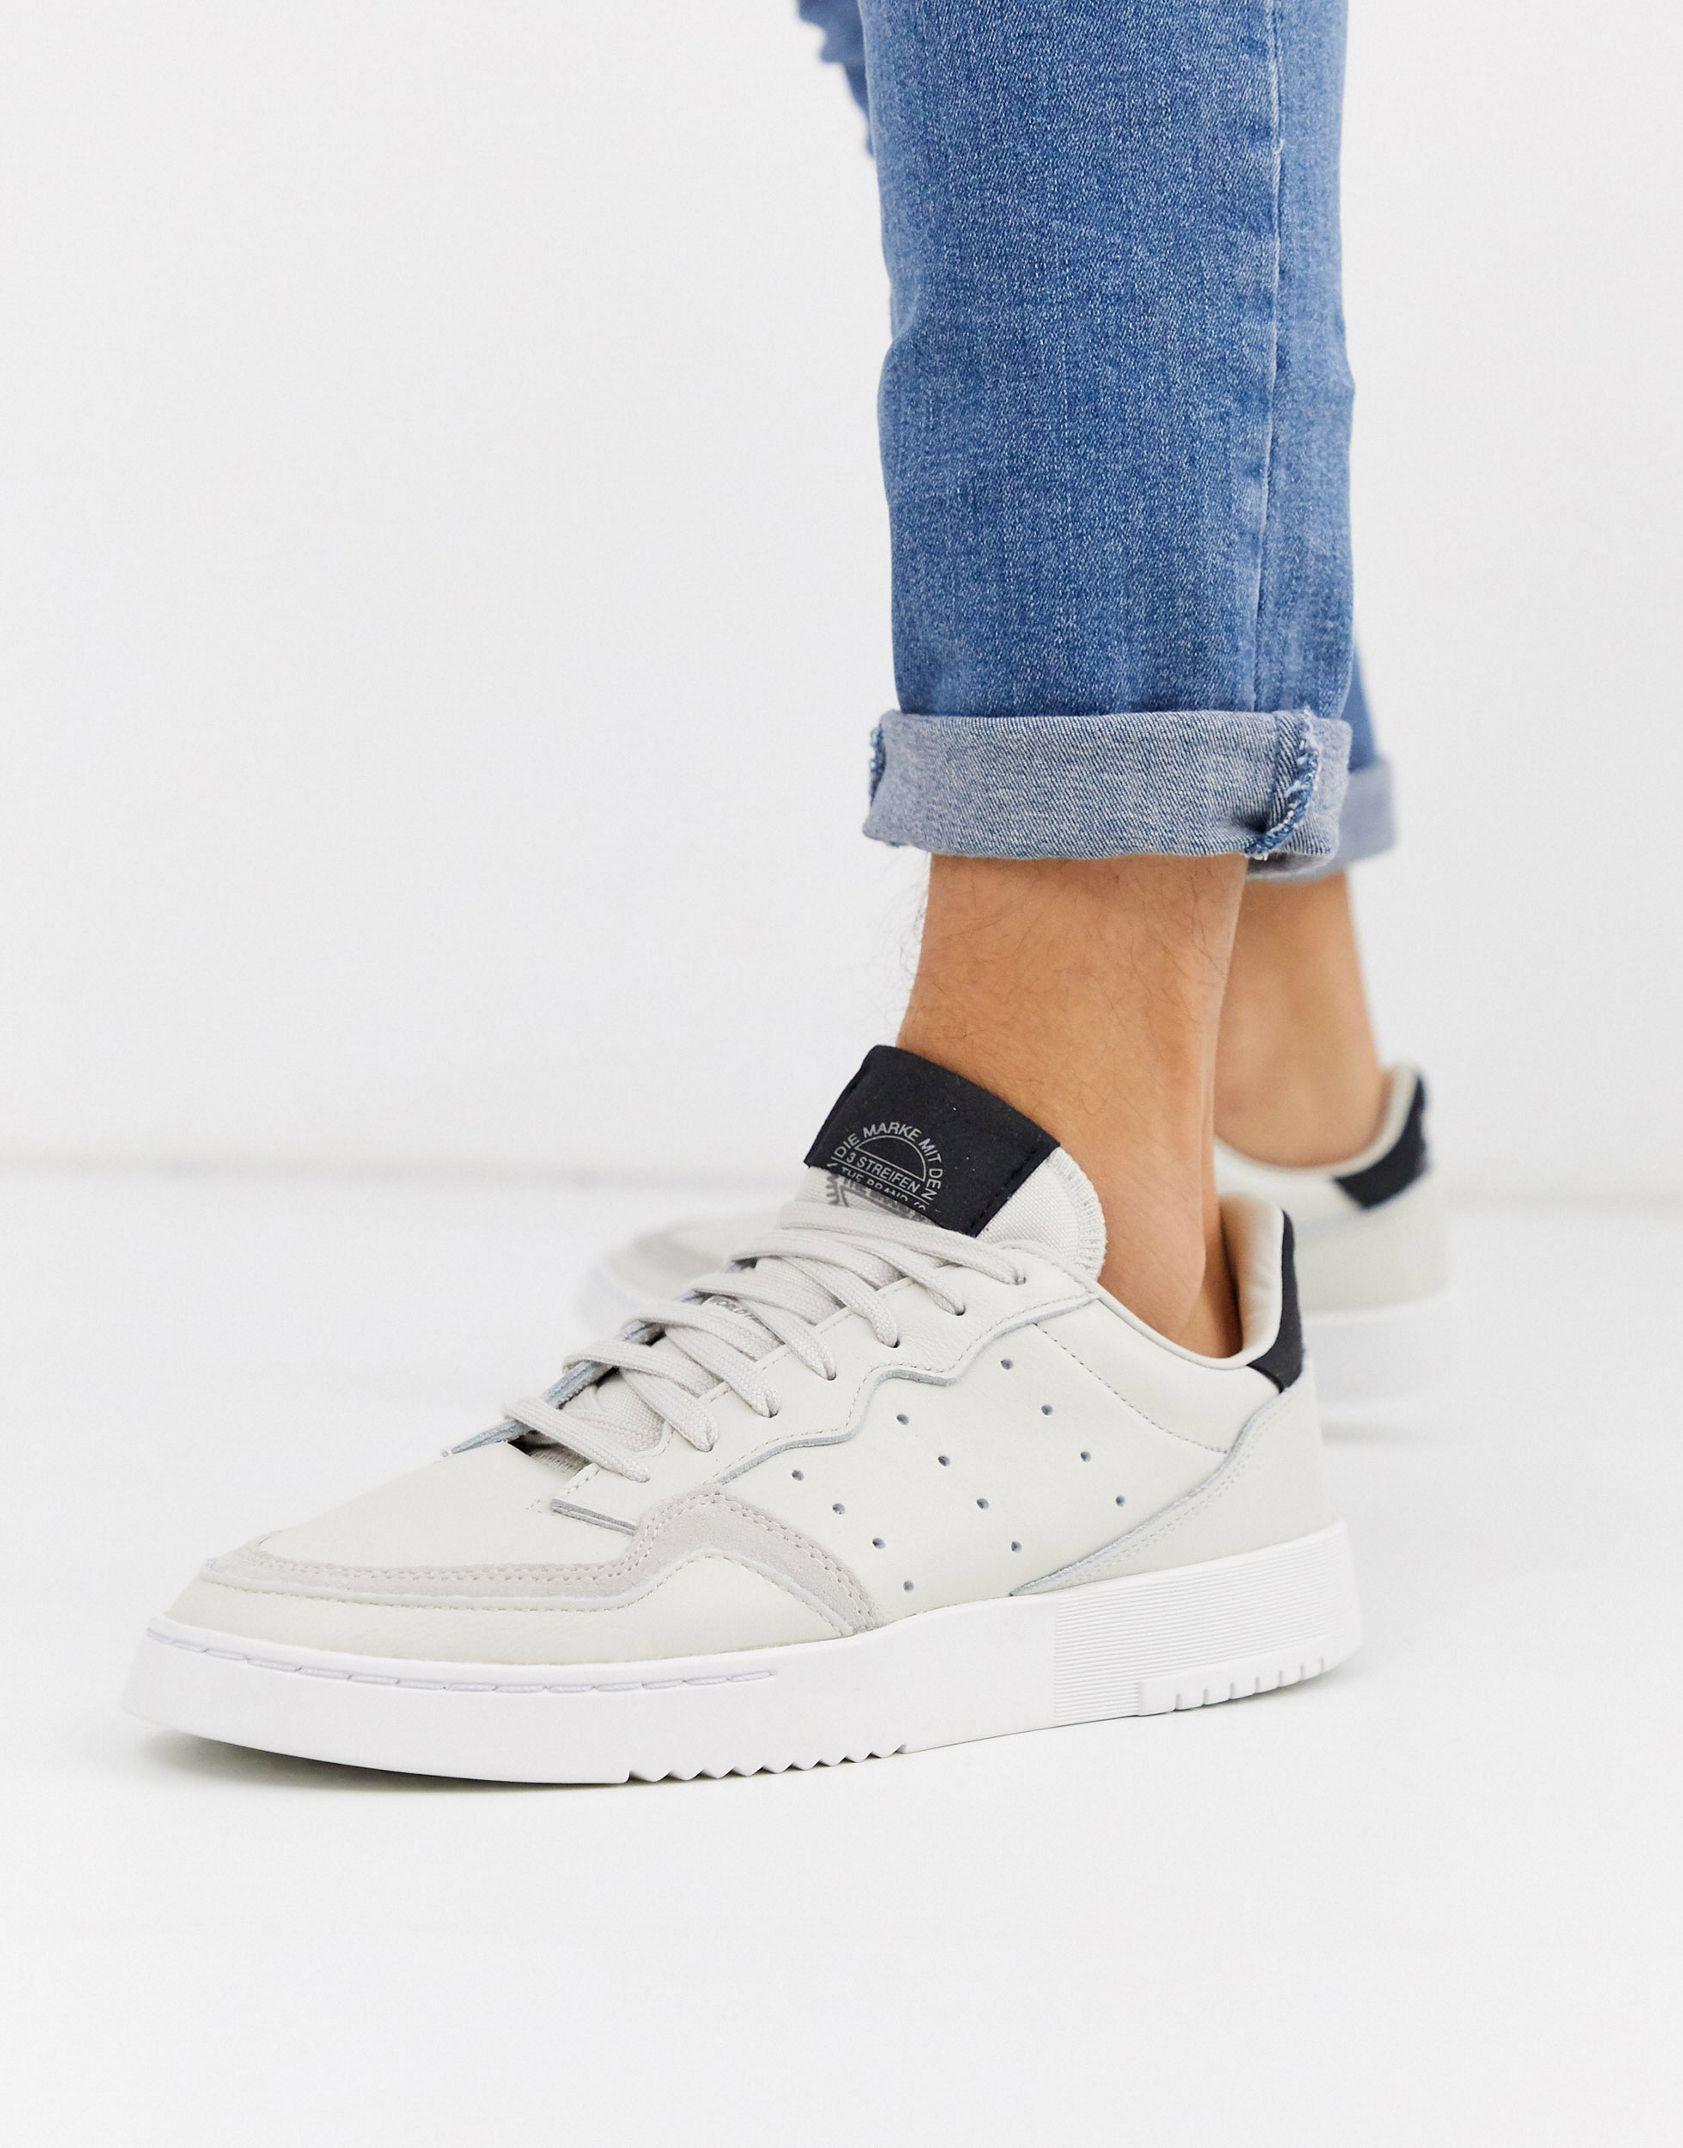 adidas Originals supercourt trainers in off white - ASOS Price Checker